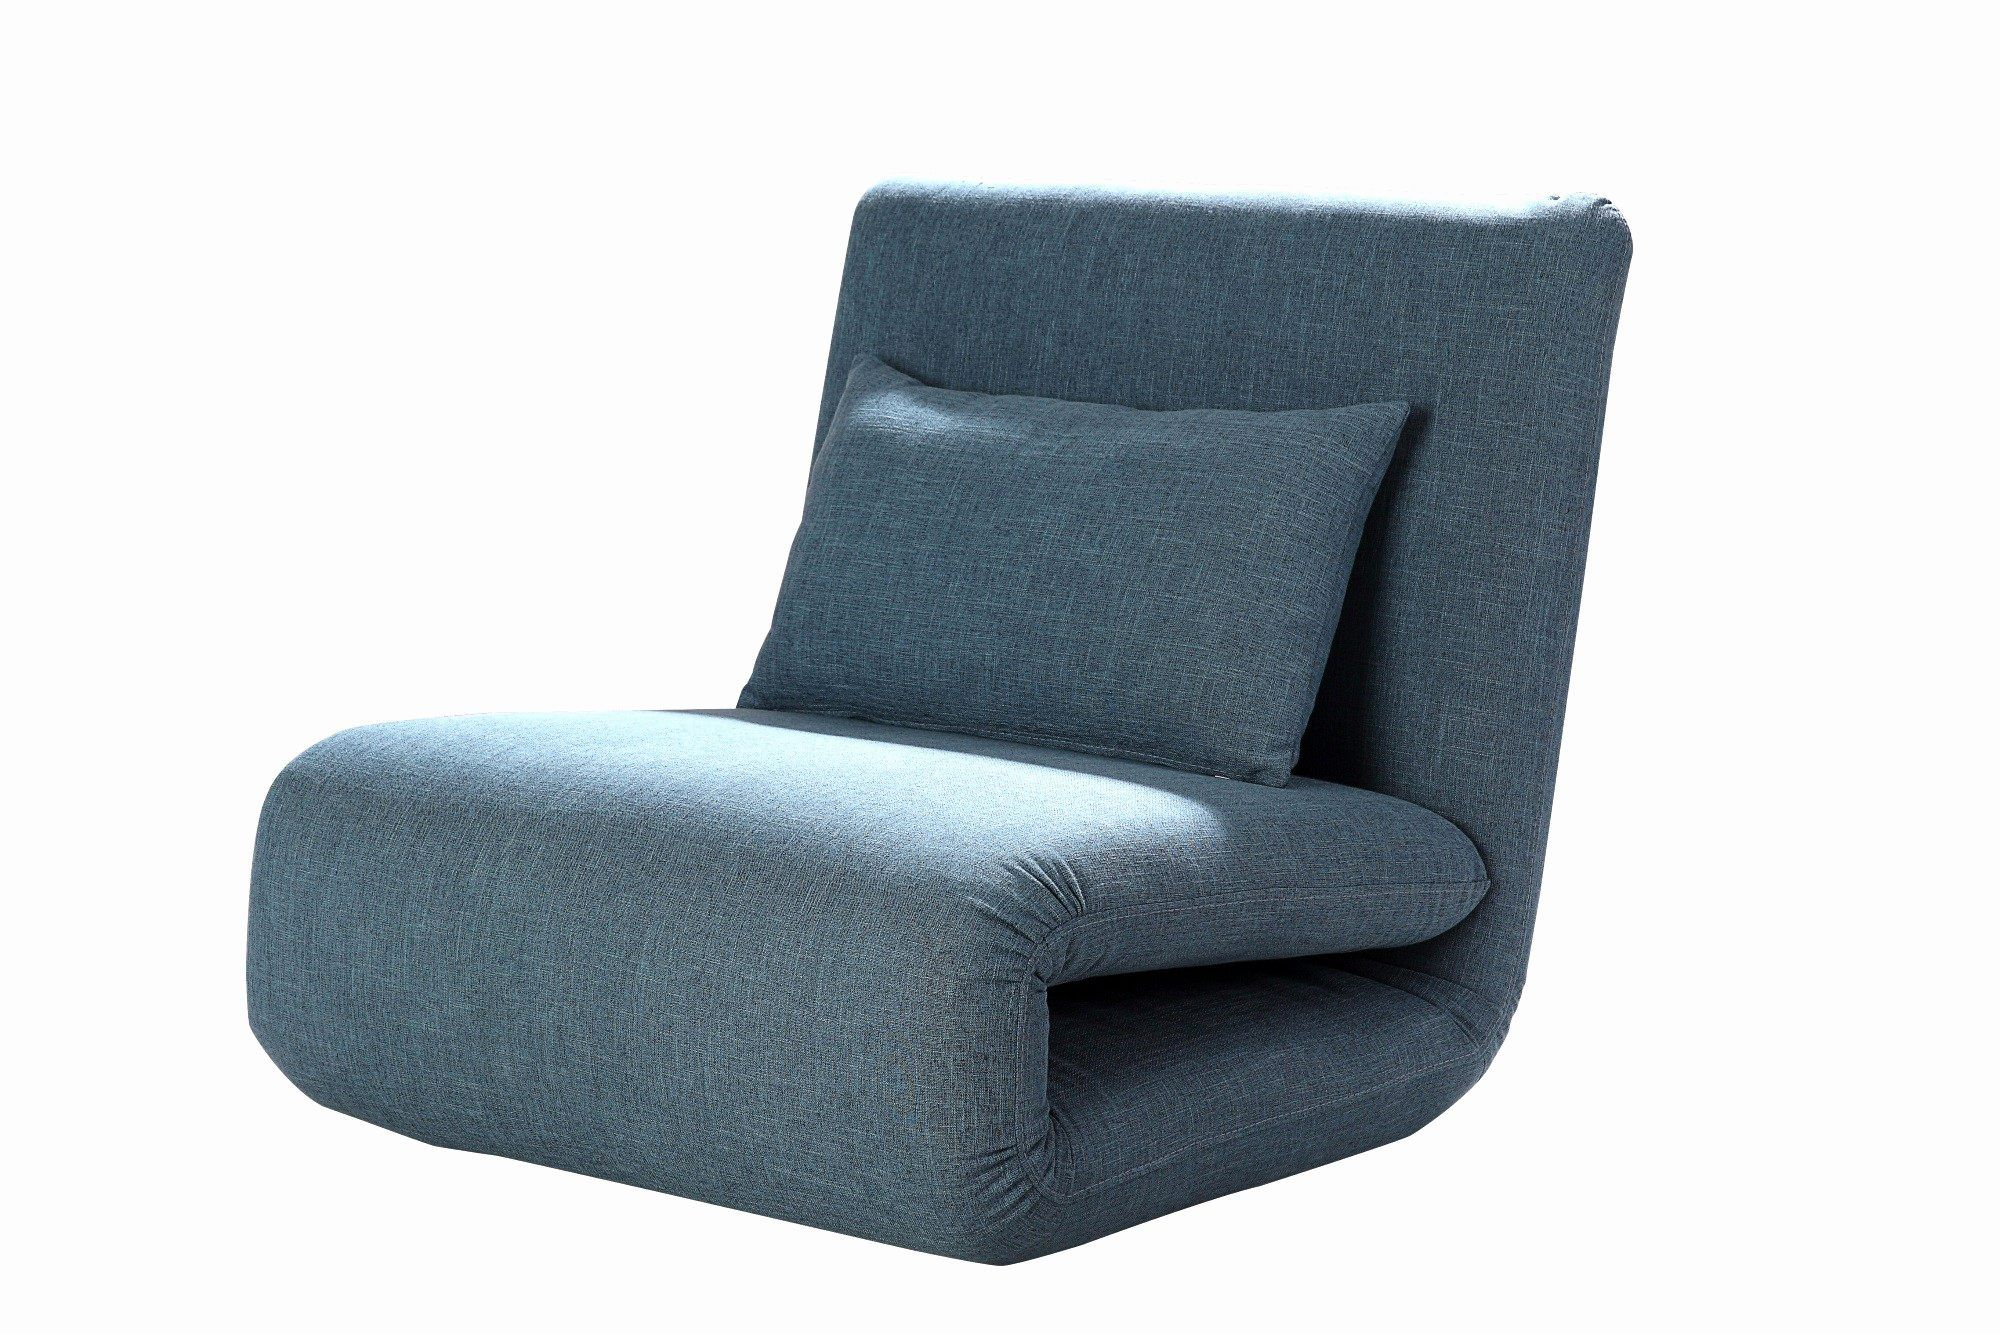 Fauteuil Lit Convertible Alinea pin. on interior | fauteuil design, transforming